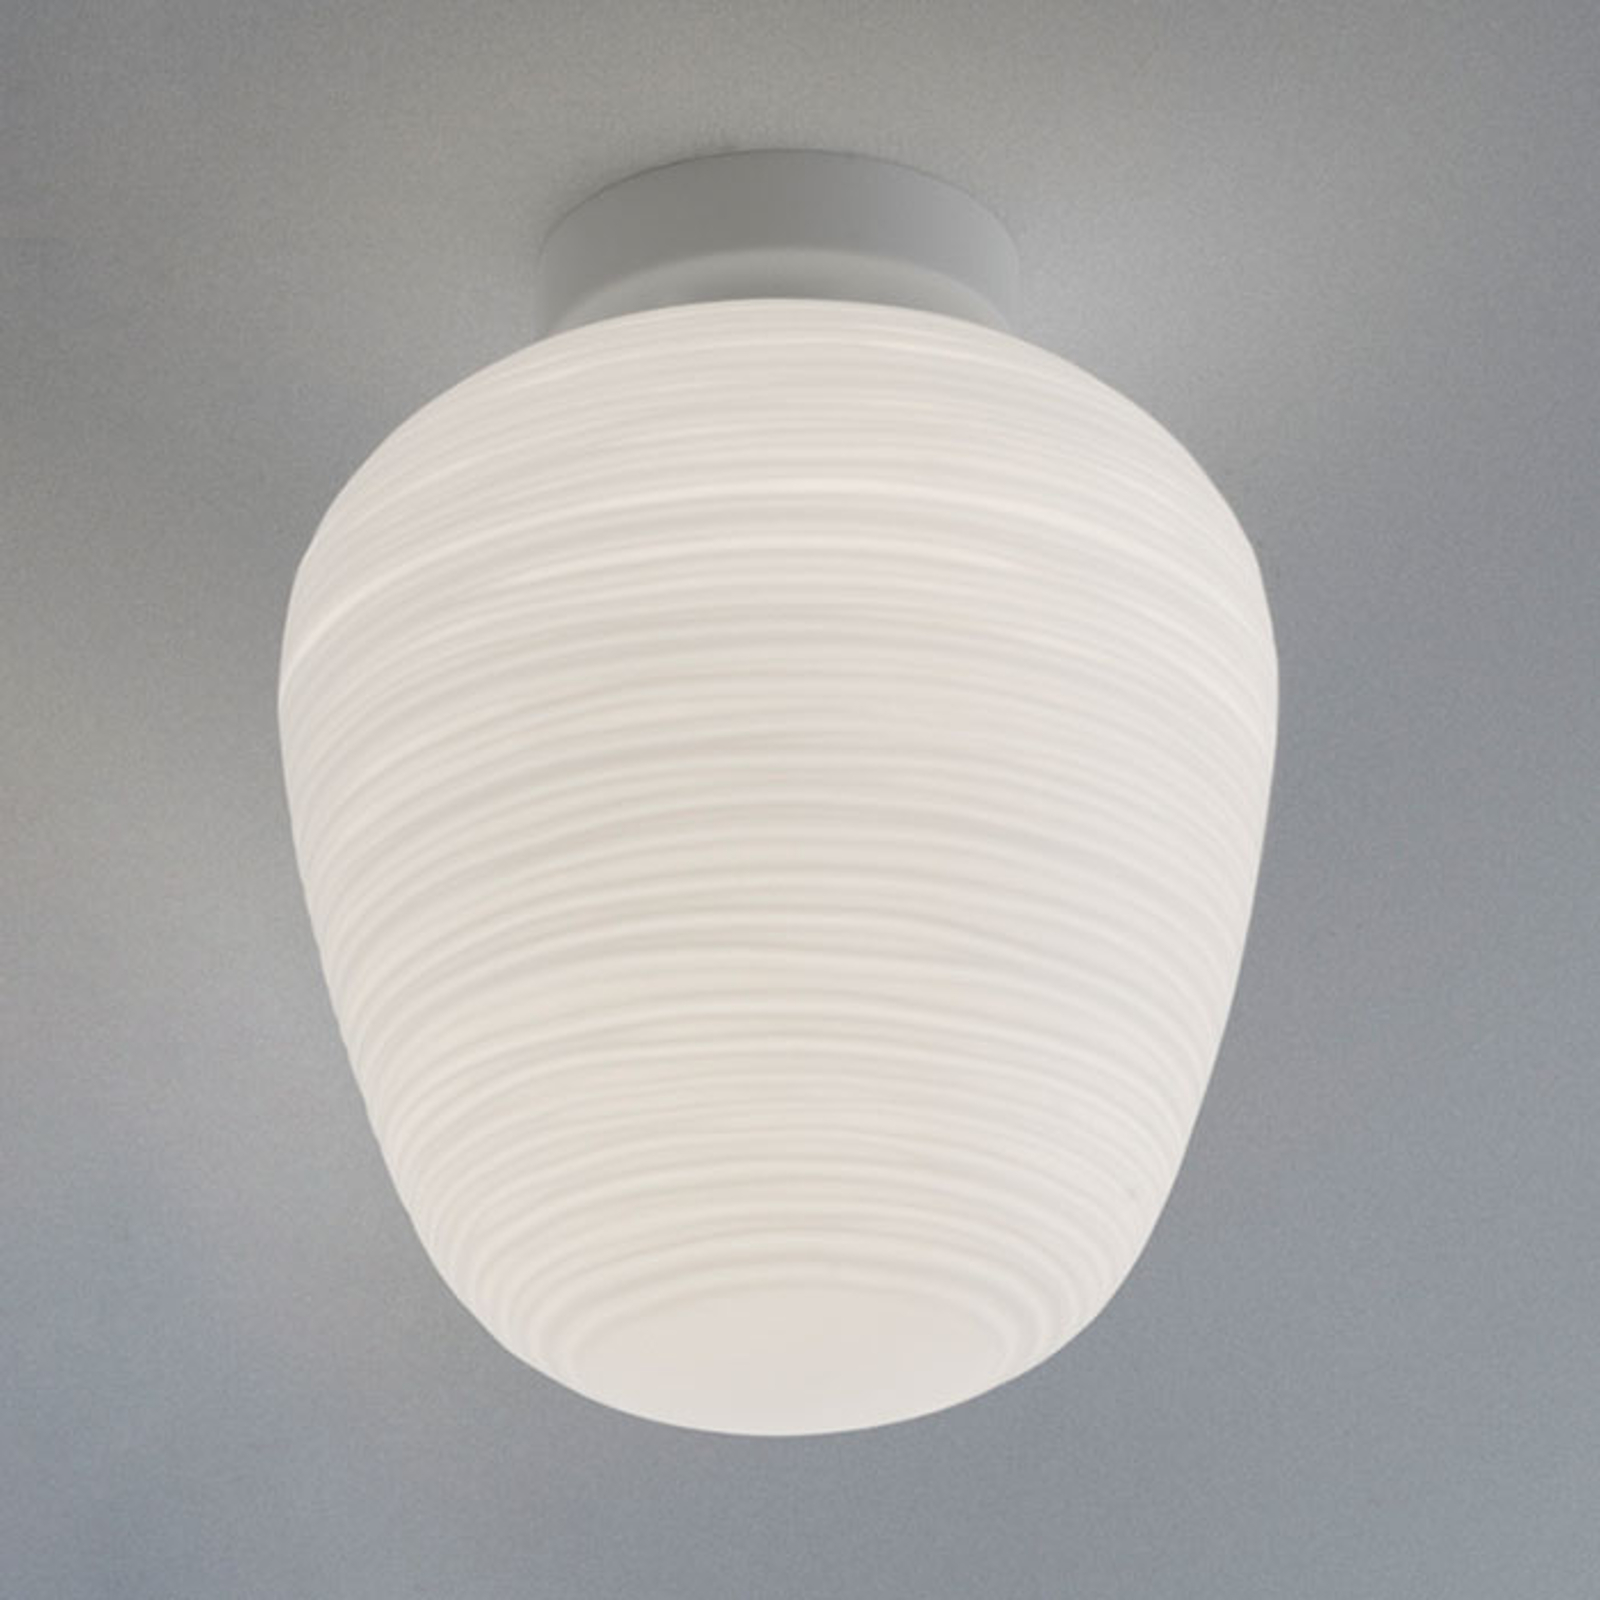 Foscarini Rituals 3 glasstaklampe